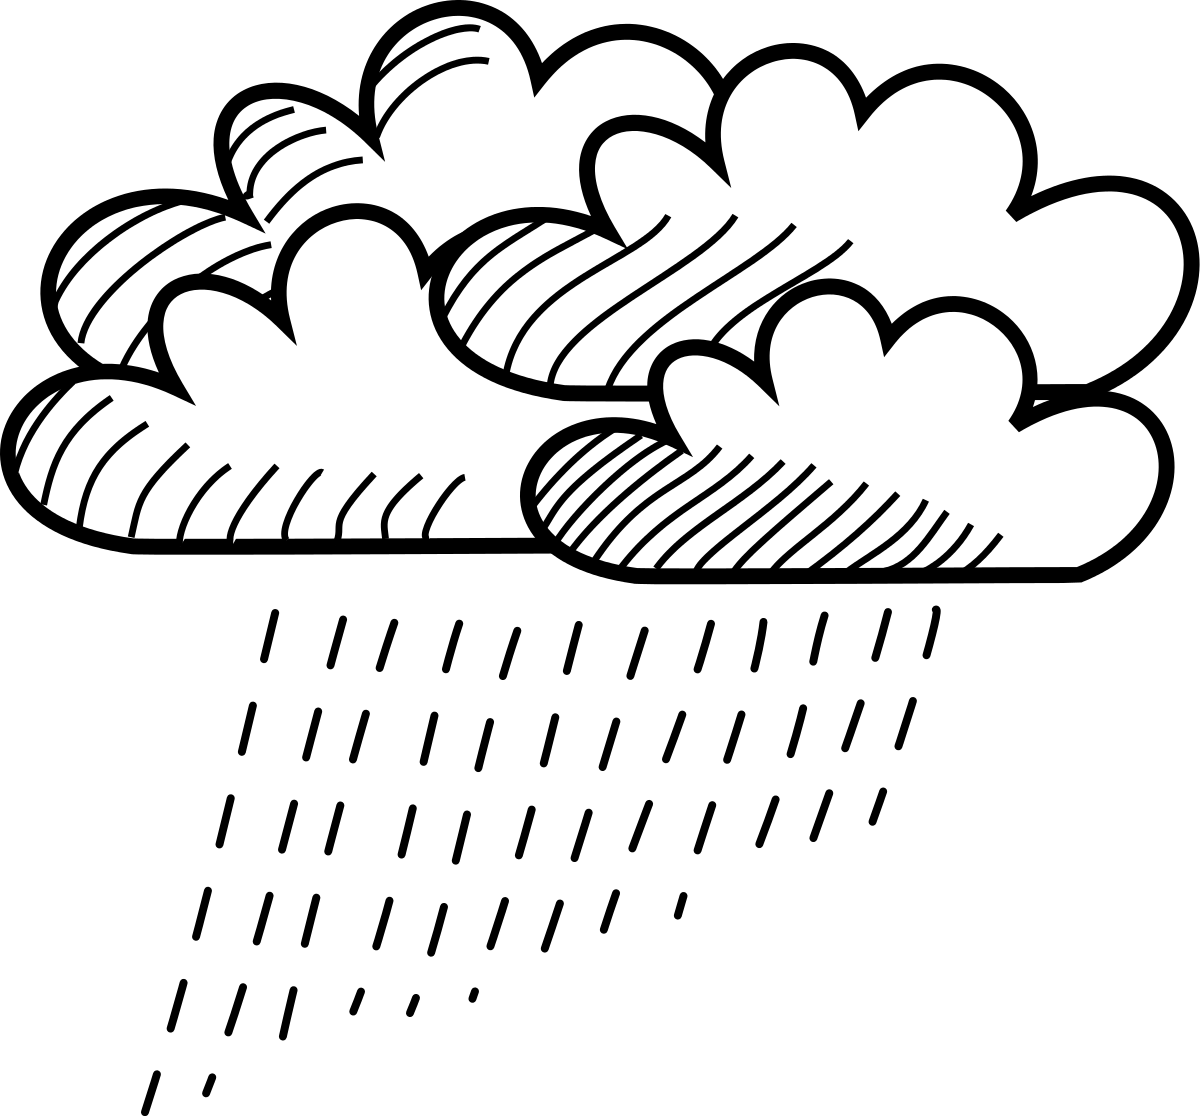 rain cloud sketch